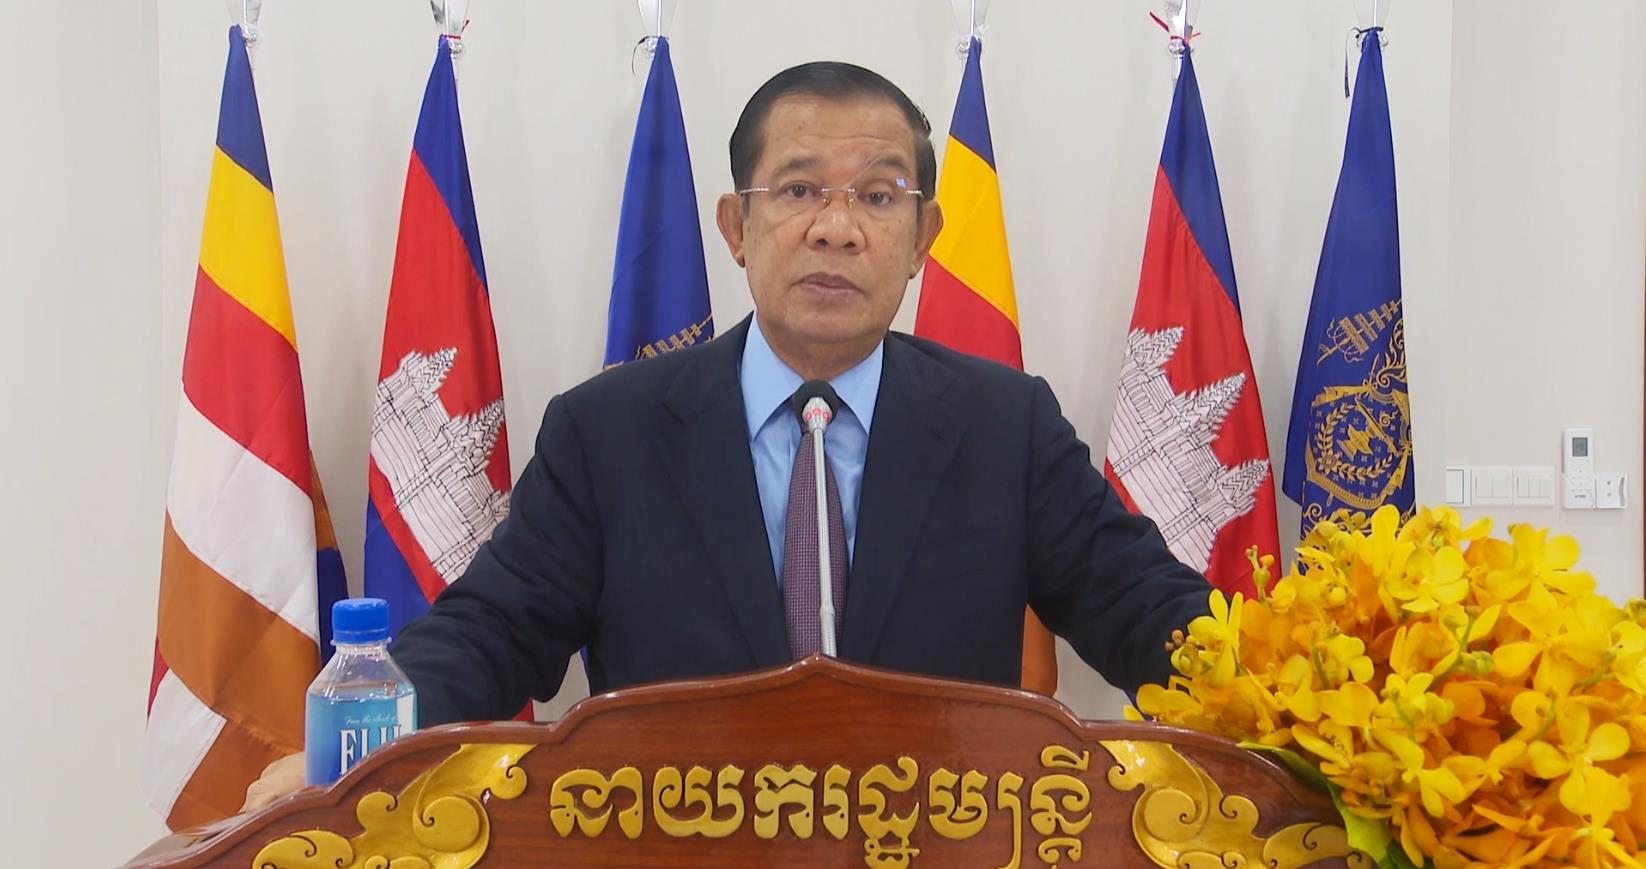 PM Hun Sen's Full Remarks at the General Debate of the 76th UNGA